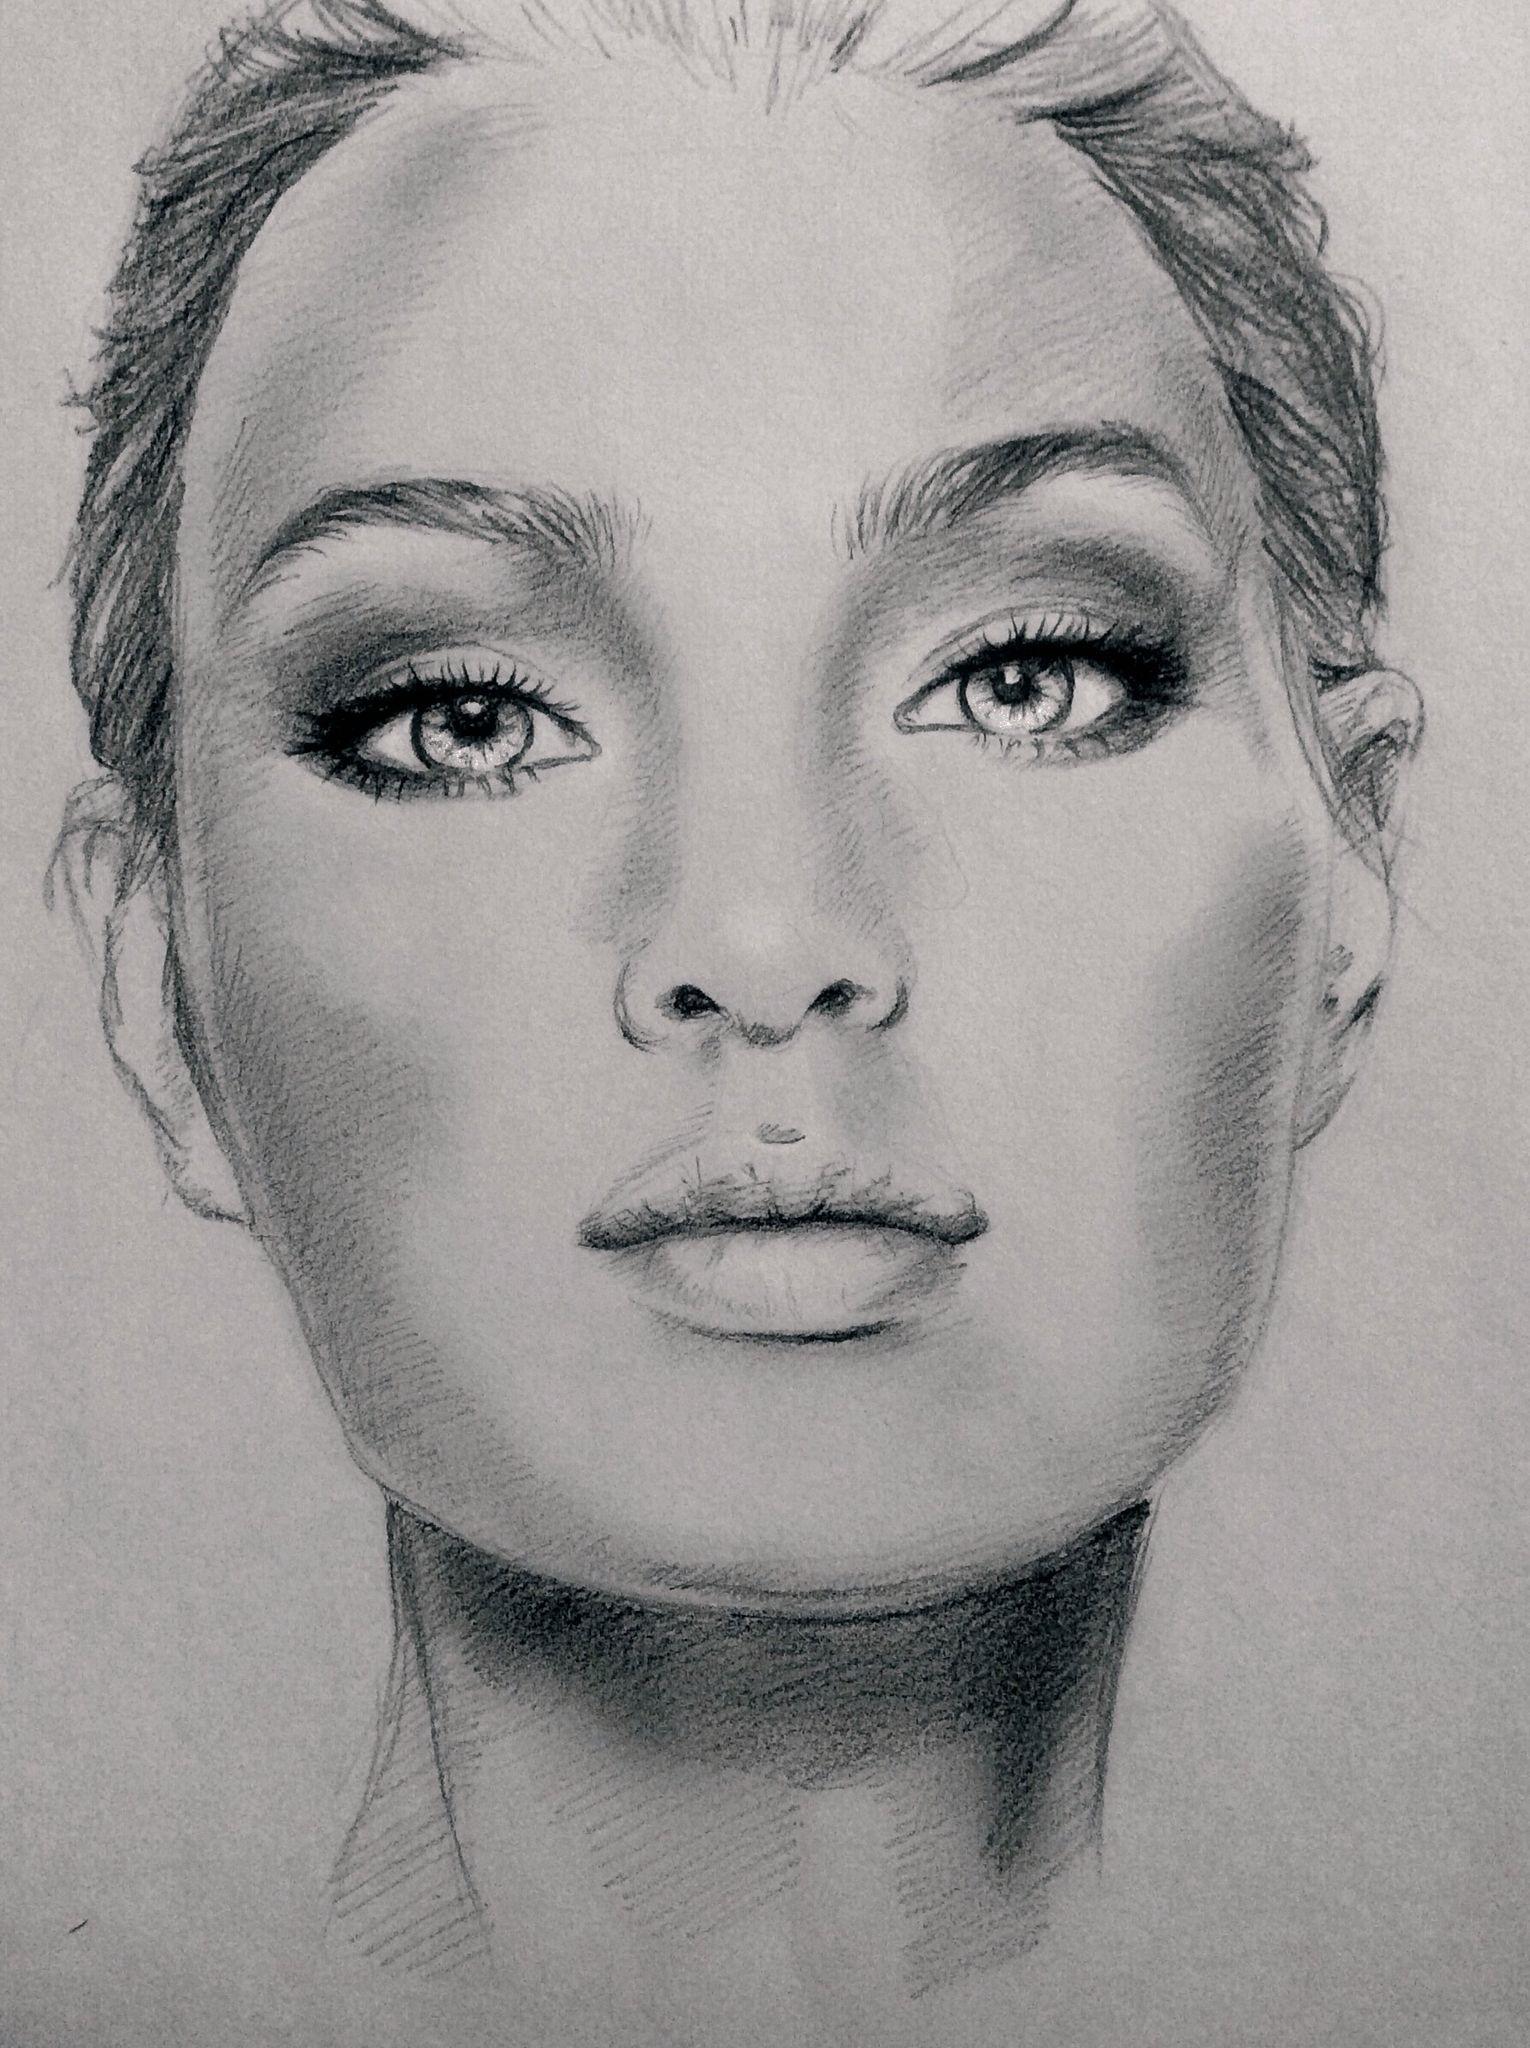 Картинки пеликанов, картинки лица женщины карандашом